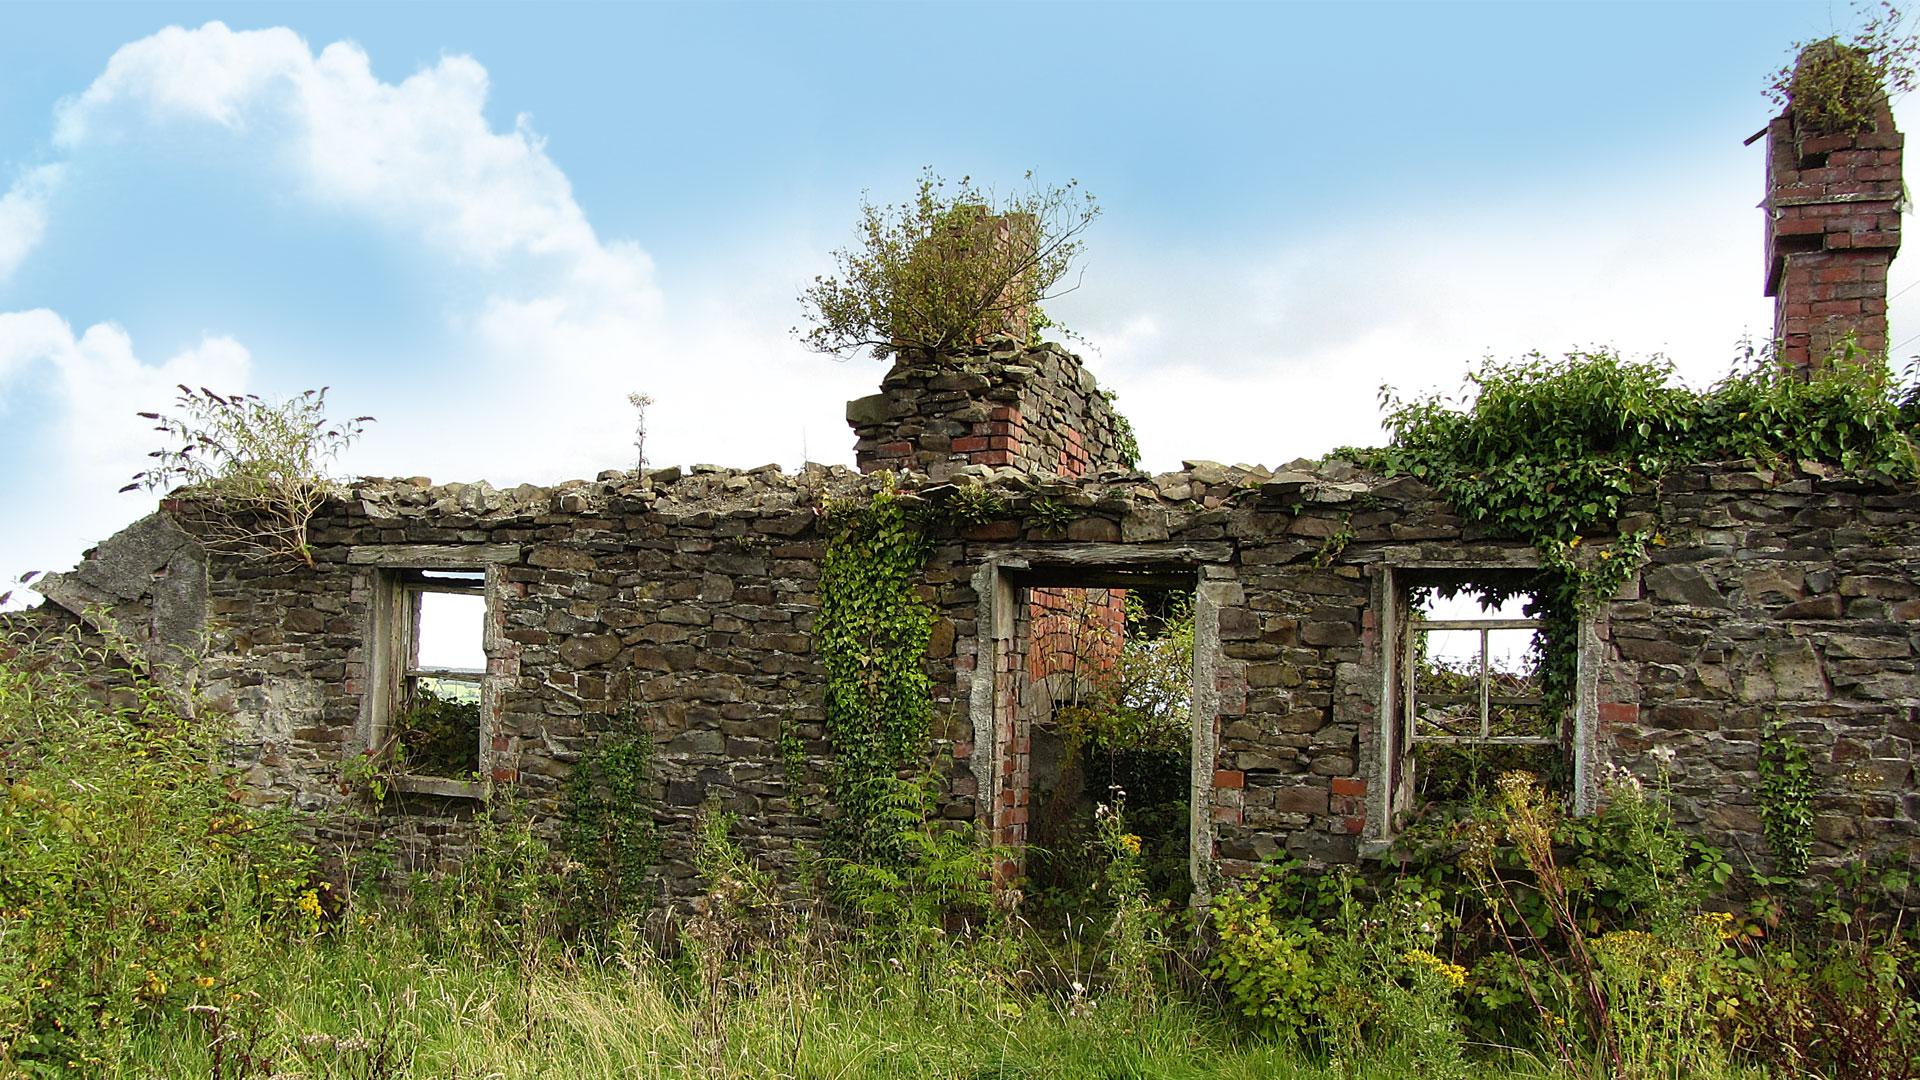 Views from The Ballagh, Durrow.